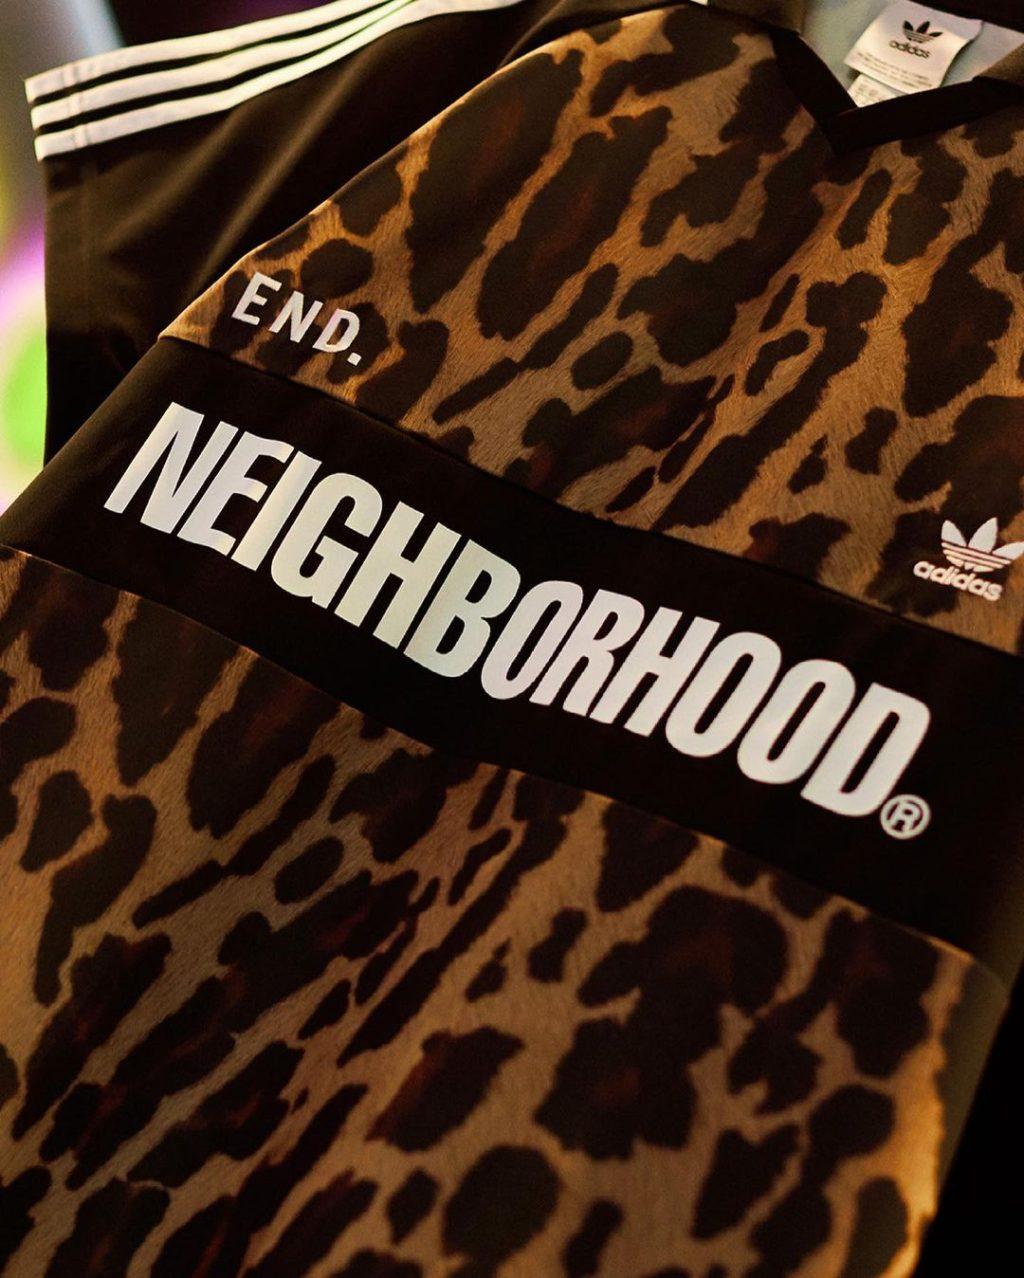 neighborhood-end-adidas-campus-samba-gx5004-gx5005-release-20210626